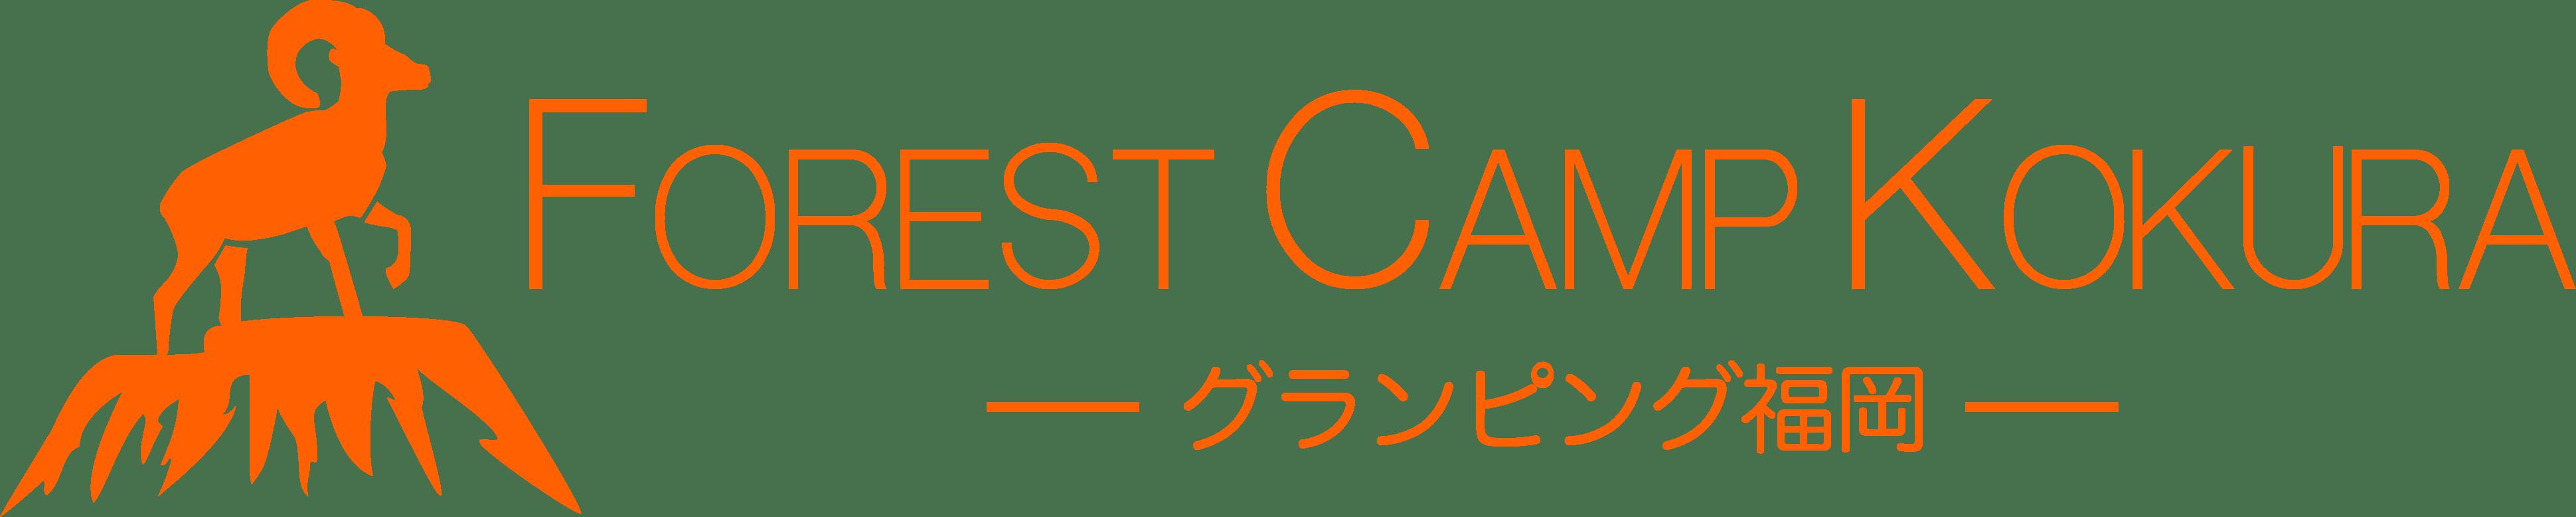 FOREST CAMP KOKURA    -グランピング福岡-